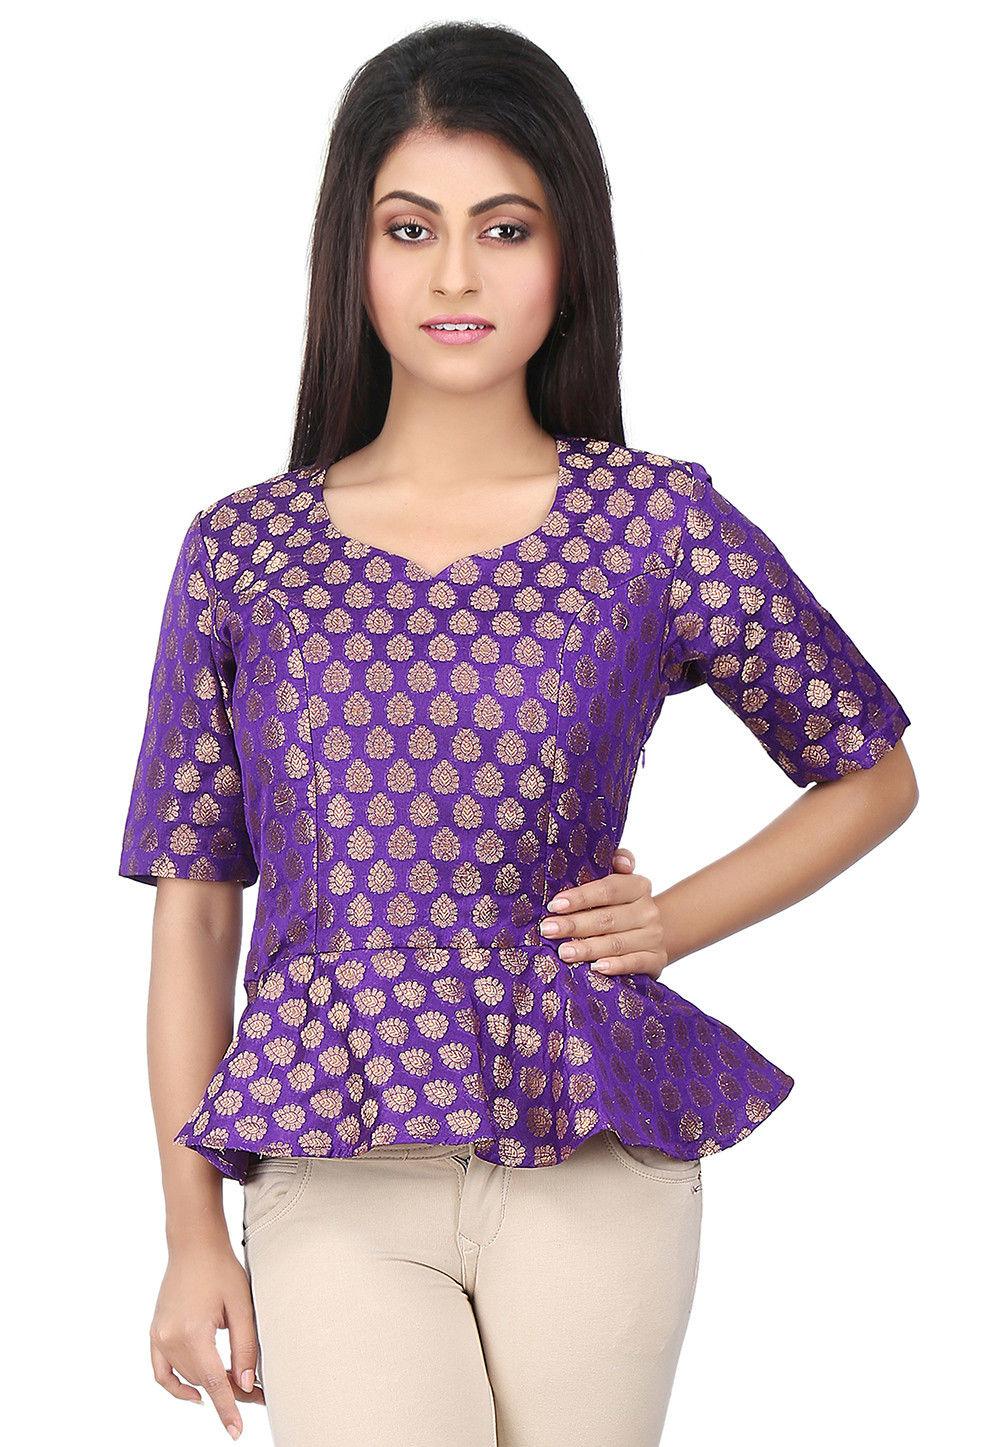 Woven Chanderi Silk Peplum Style Top in Purple